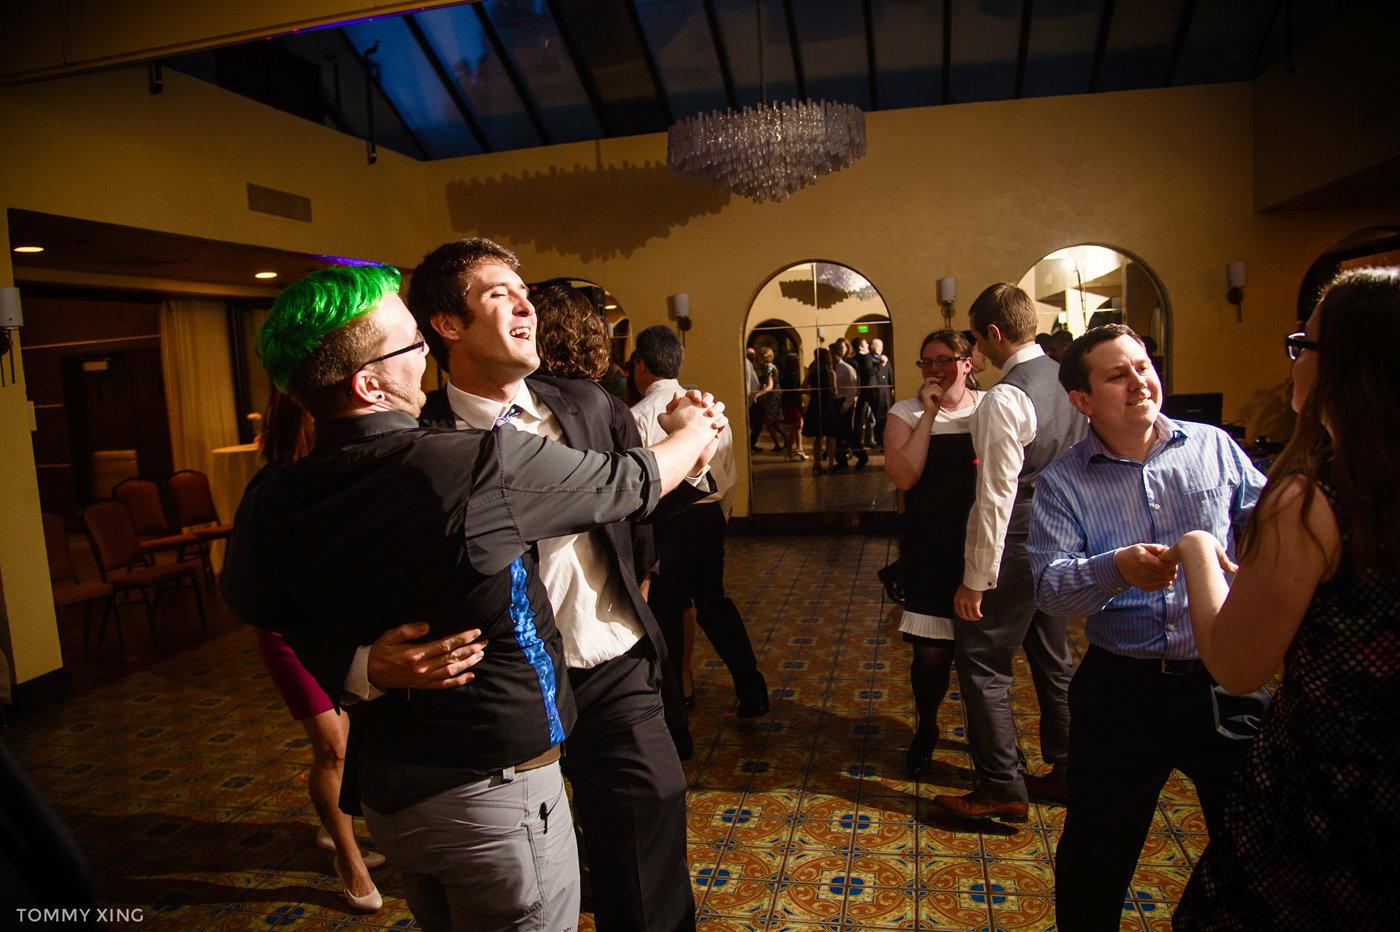 STANFORD MEMORIAL CHURCH WEDDING - Wenjie & Chengcheng - SAN FRANCISCO BAY AREA 斯坦福教堂婚礼跟拍 - 洛杉矶婚礼婚纱照摄影师 Tommy Xing Photography273.jpg